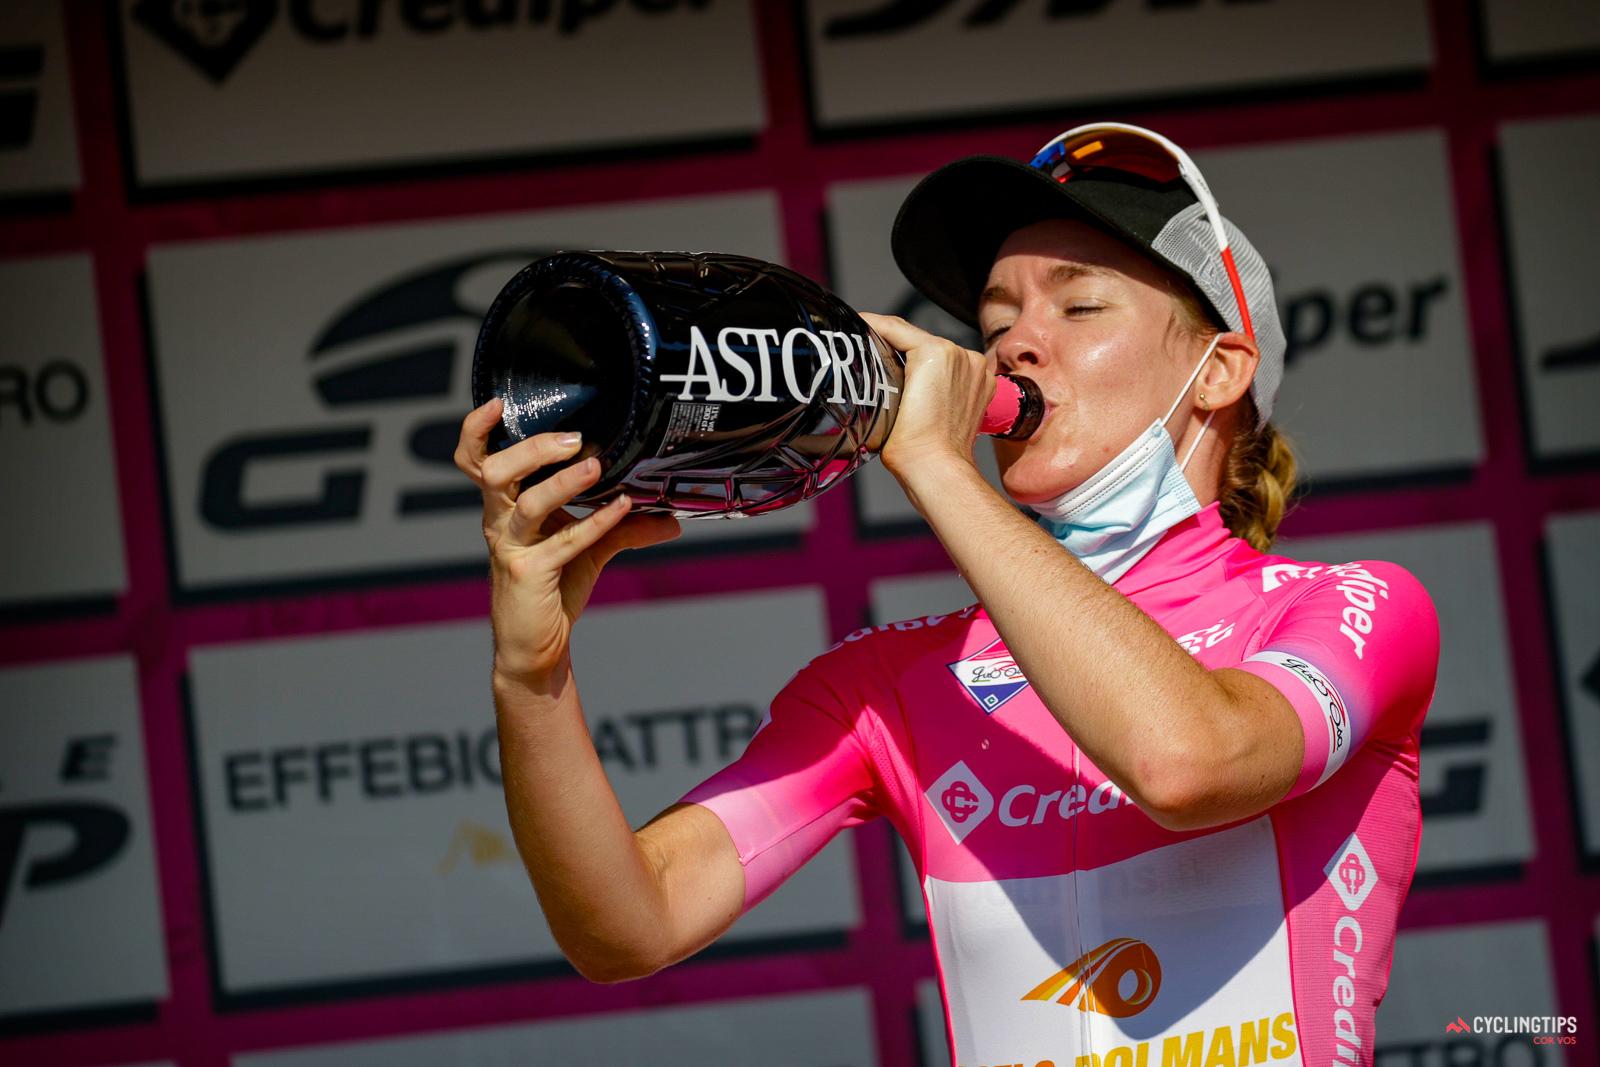 Anna Van der Breggen wins the Giro Rosa, Évita Muzic takes final stage